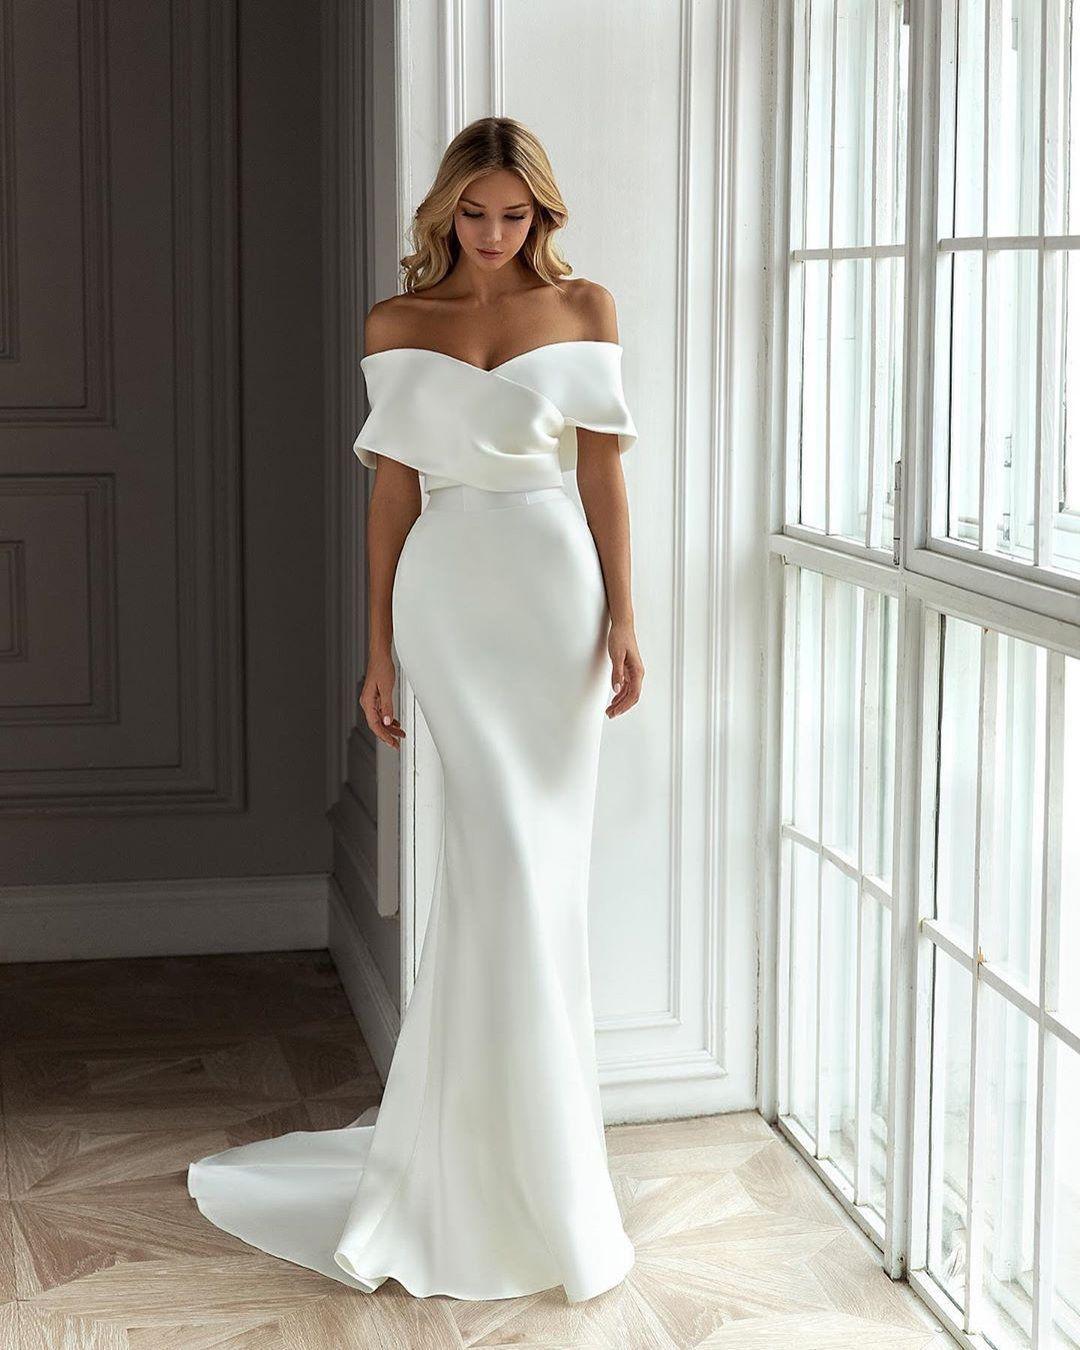 10 Wedding Dress Designers You Will Love Stylish Wedding Dresses Plain Wedding Dress Wedding Dresses [ 1350 x 1080 Pixel ]